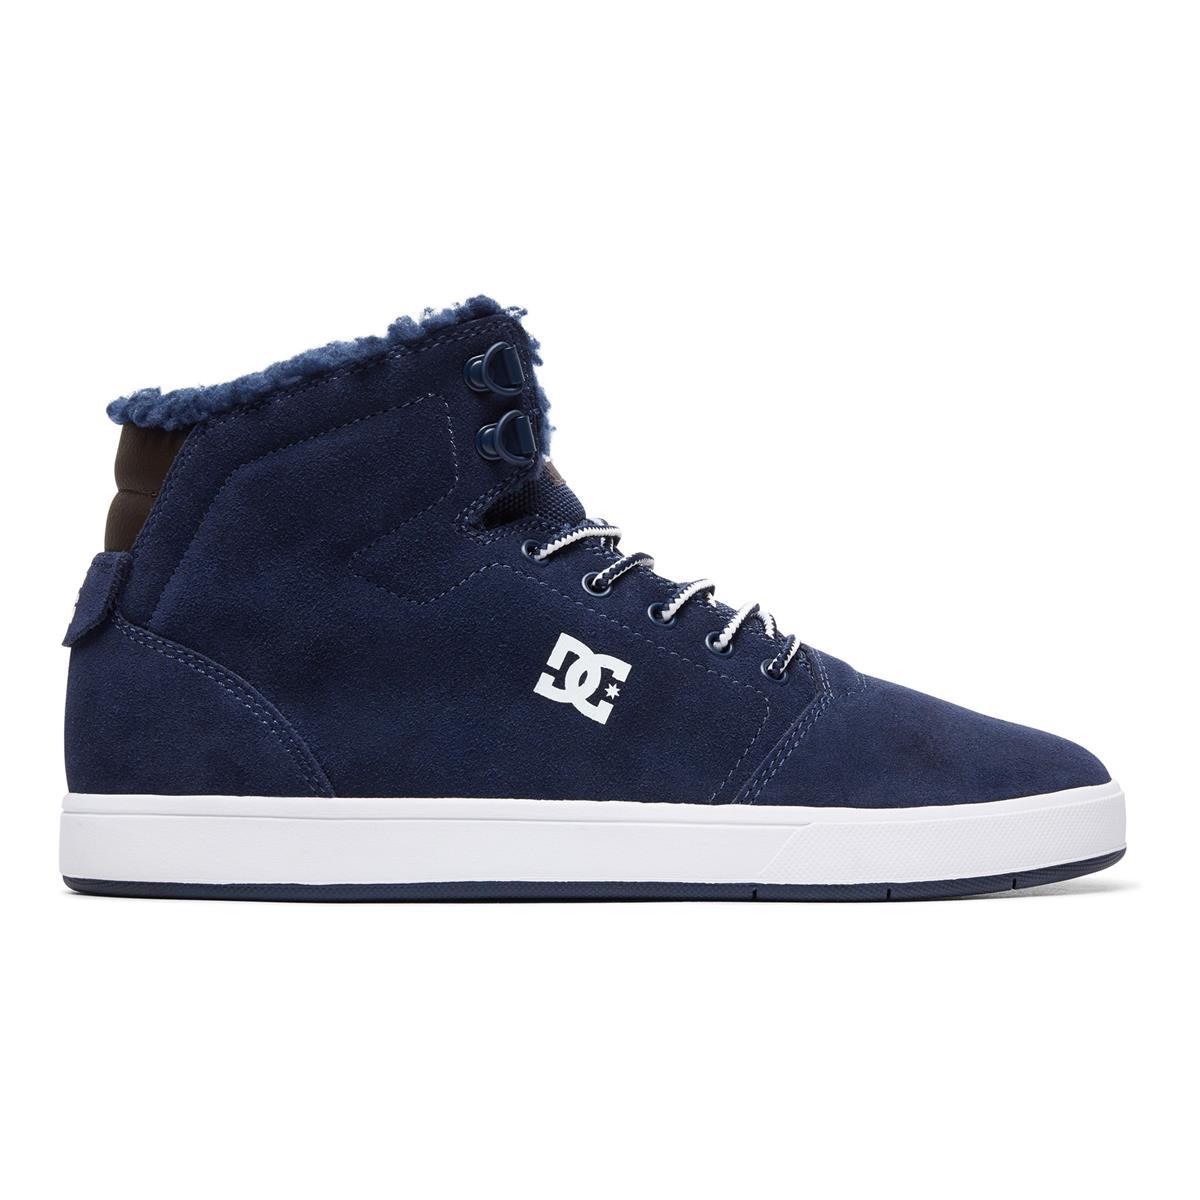 DC Hiver Chaussures Chaussures Chaussures Crisis High Navy/Kaki ba8344